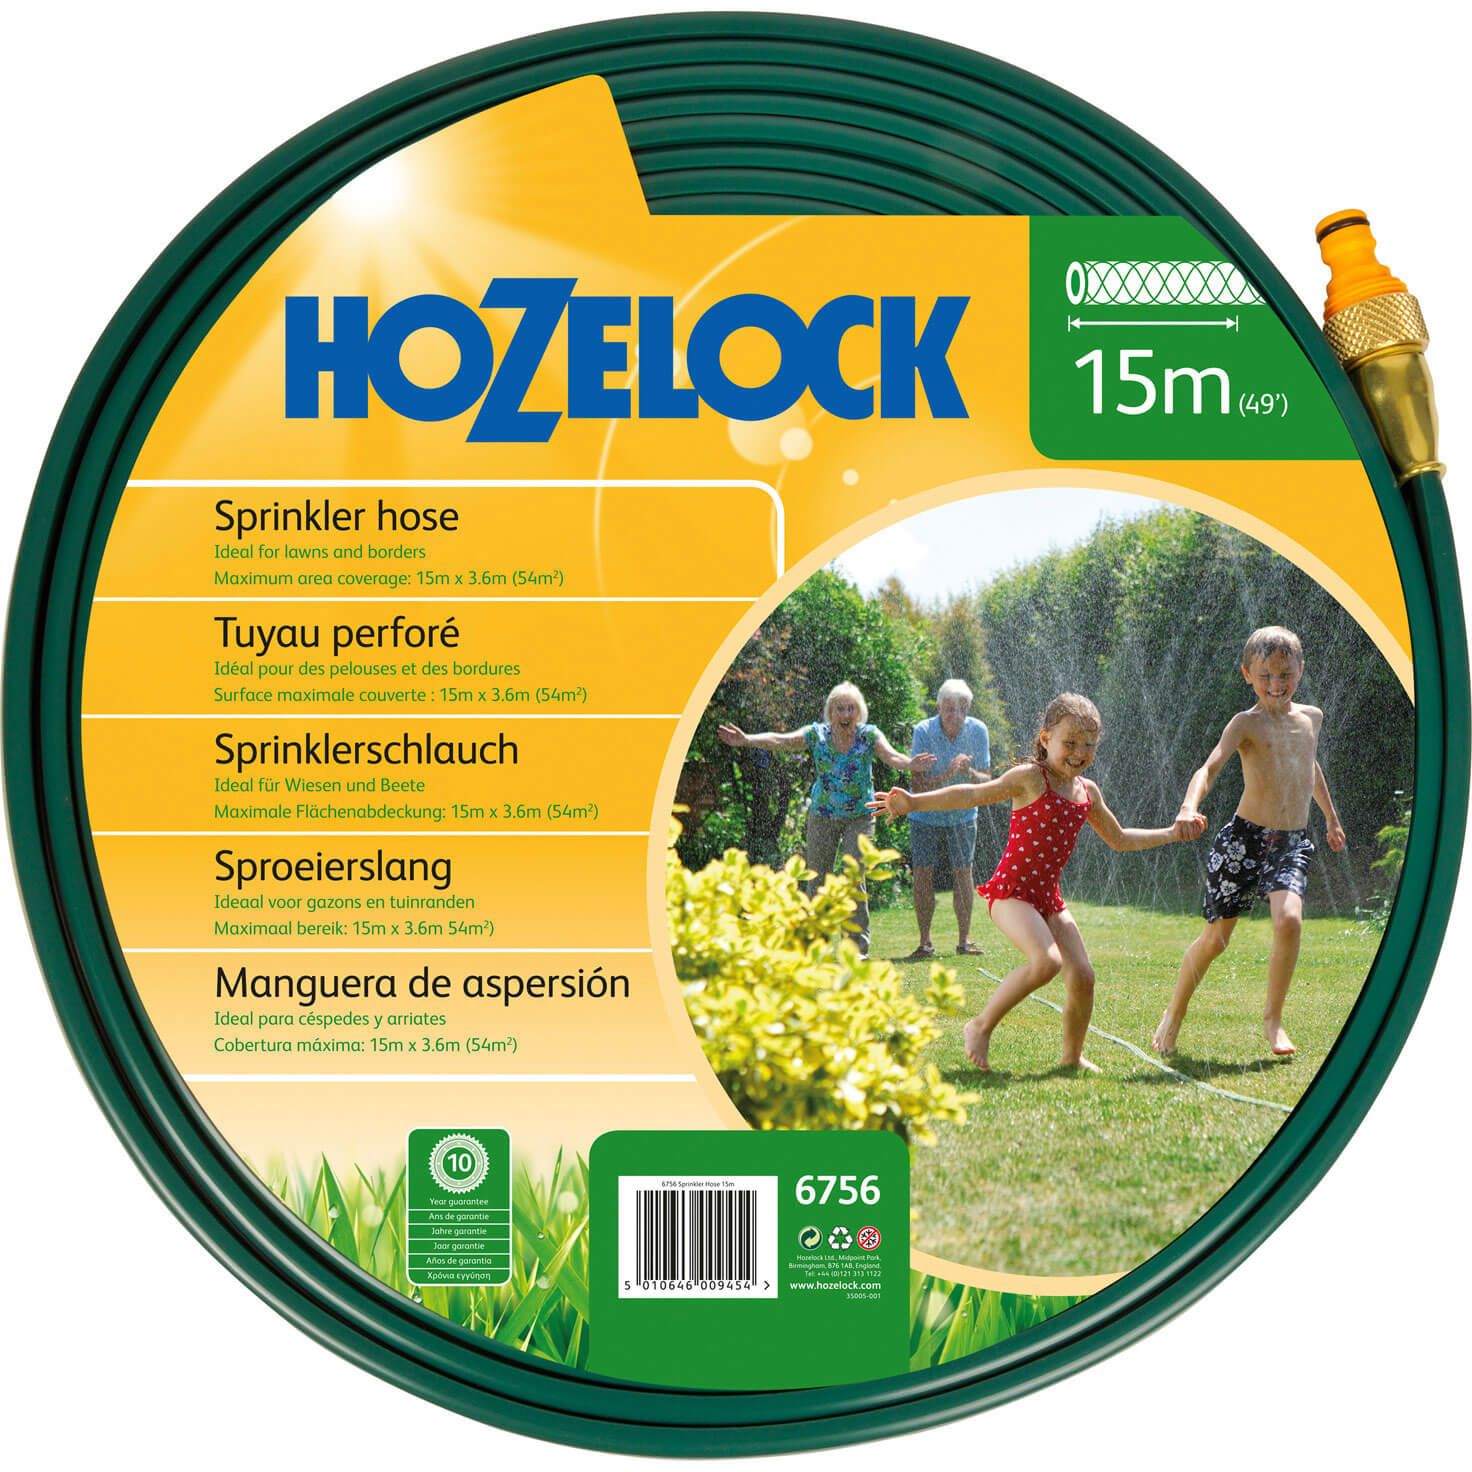 Hozelock Flat Water Sprinkler & Soaker Hose Pipe 15m